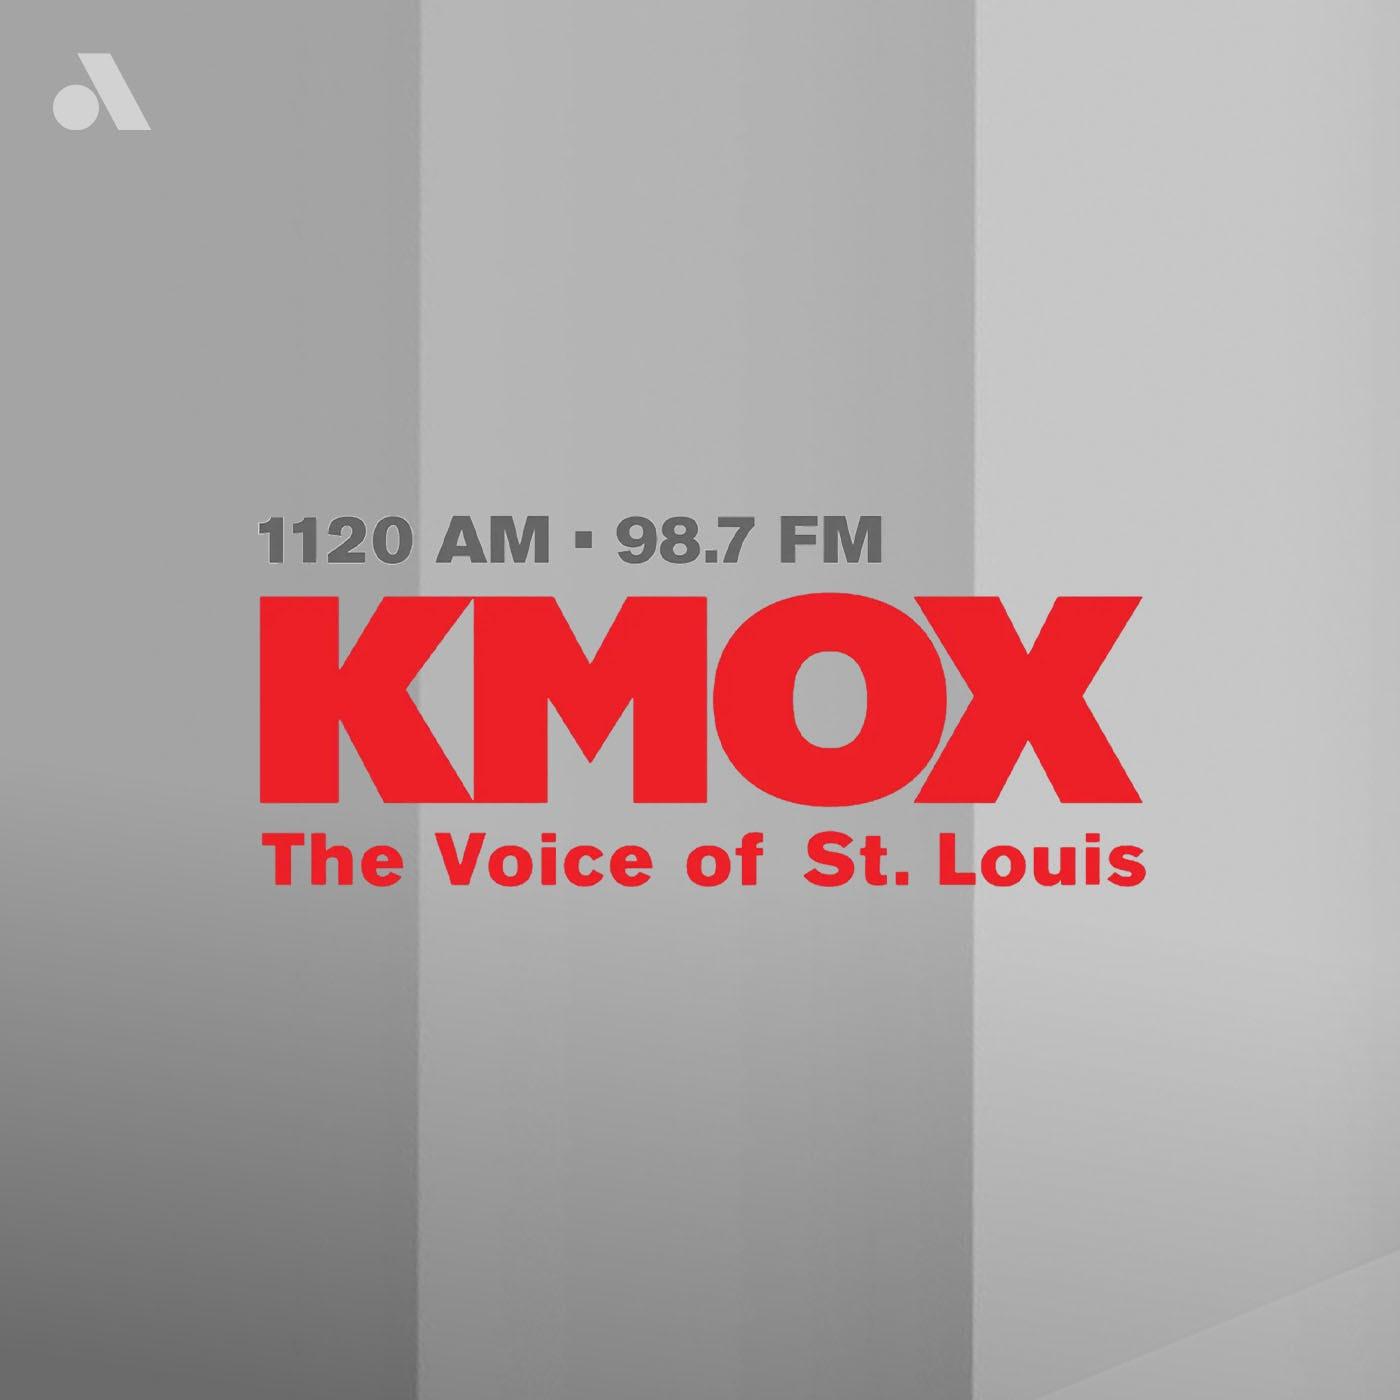 NewsRadio 1120 KMOX - The Voice Of St. Louis - LISTEN LIVE | RADIO.COM